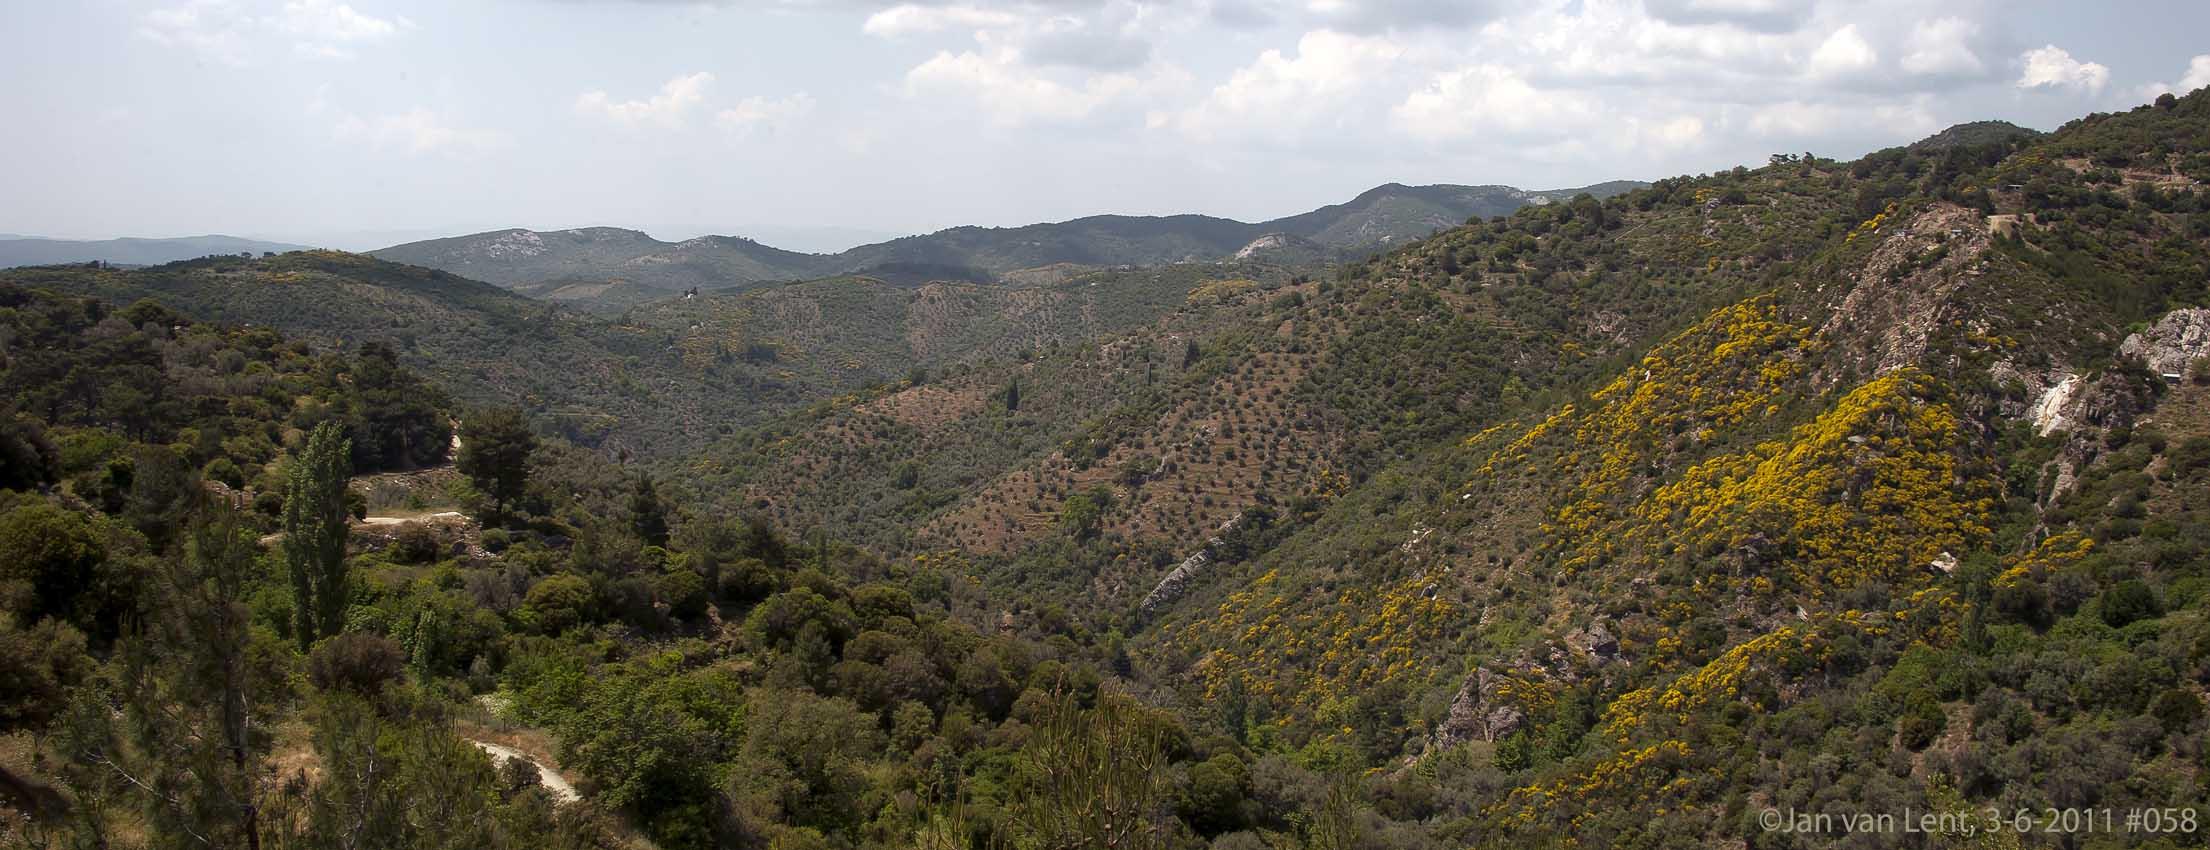 View over Megalochori mountains, © JvL 3-6-2011 #058